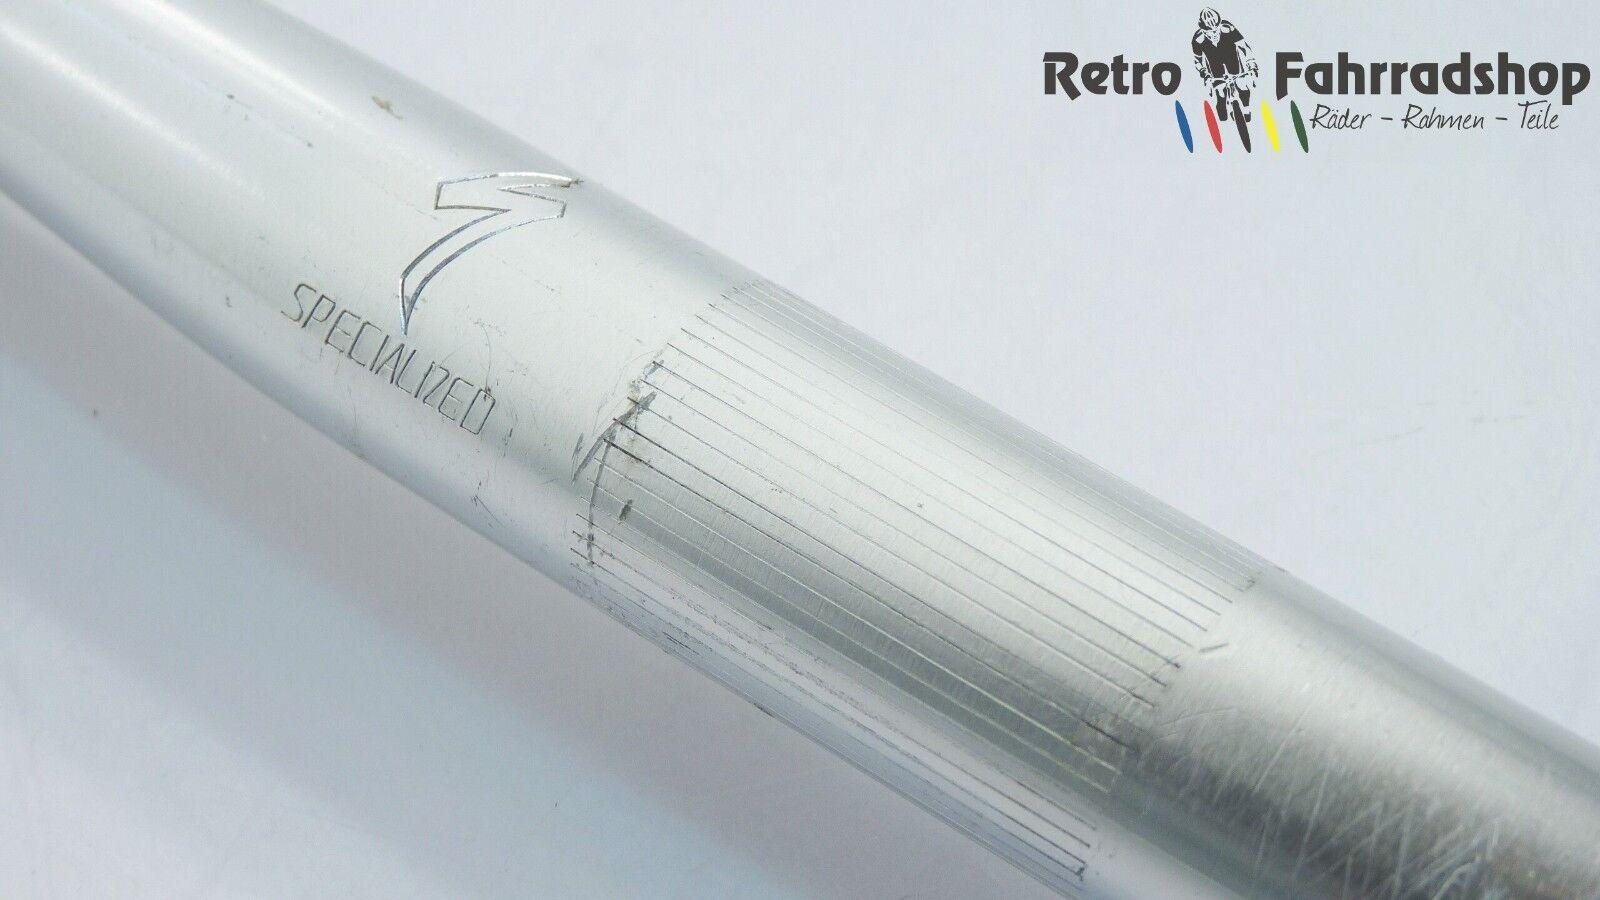 Specialized heat treated MTB manillar plata MTB 25,4mm 1988 89 rar 590mm Vintage